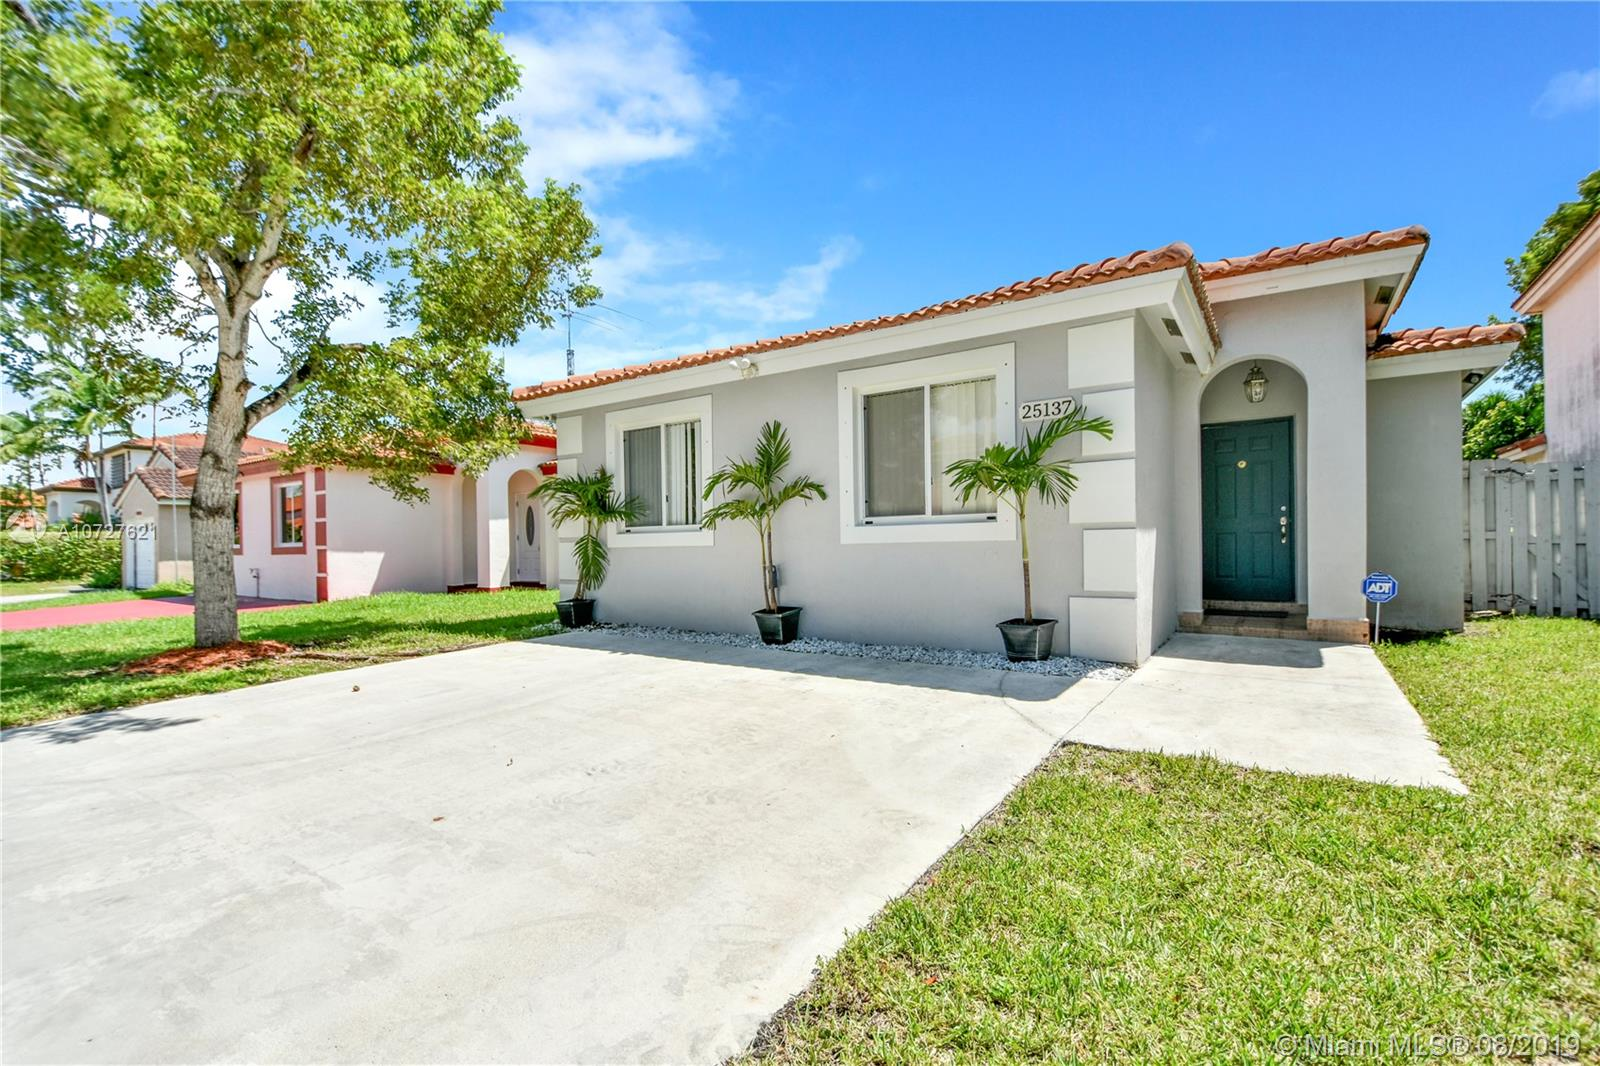 25137 124th Ct, Homestead, FL 33032 - Homestead, FL real estate listing